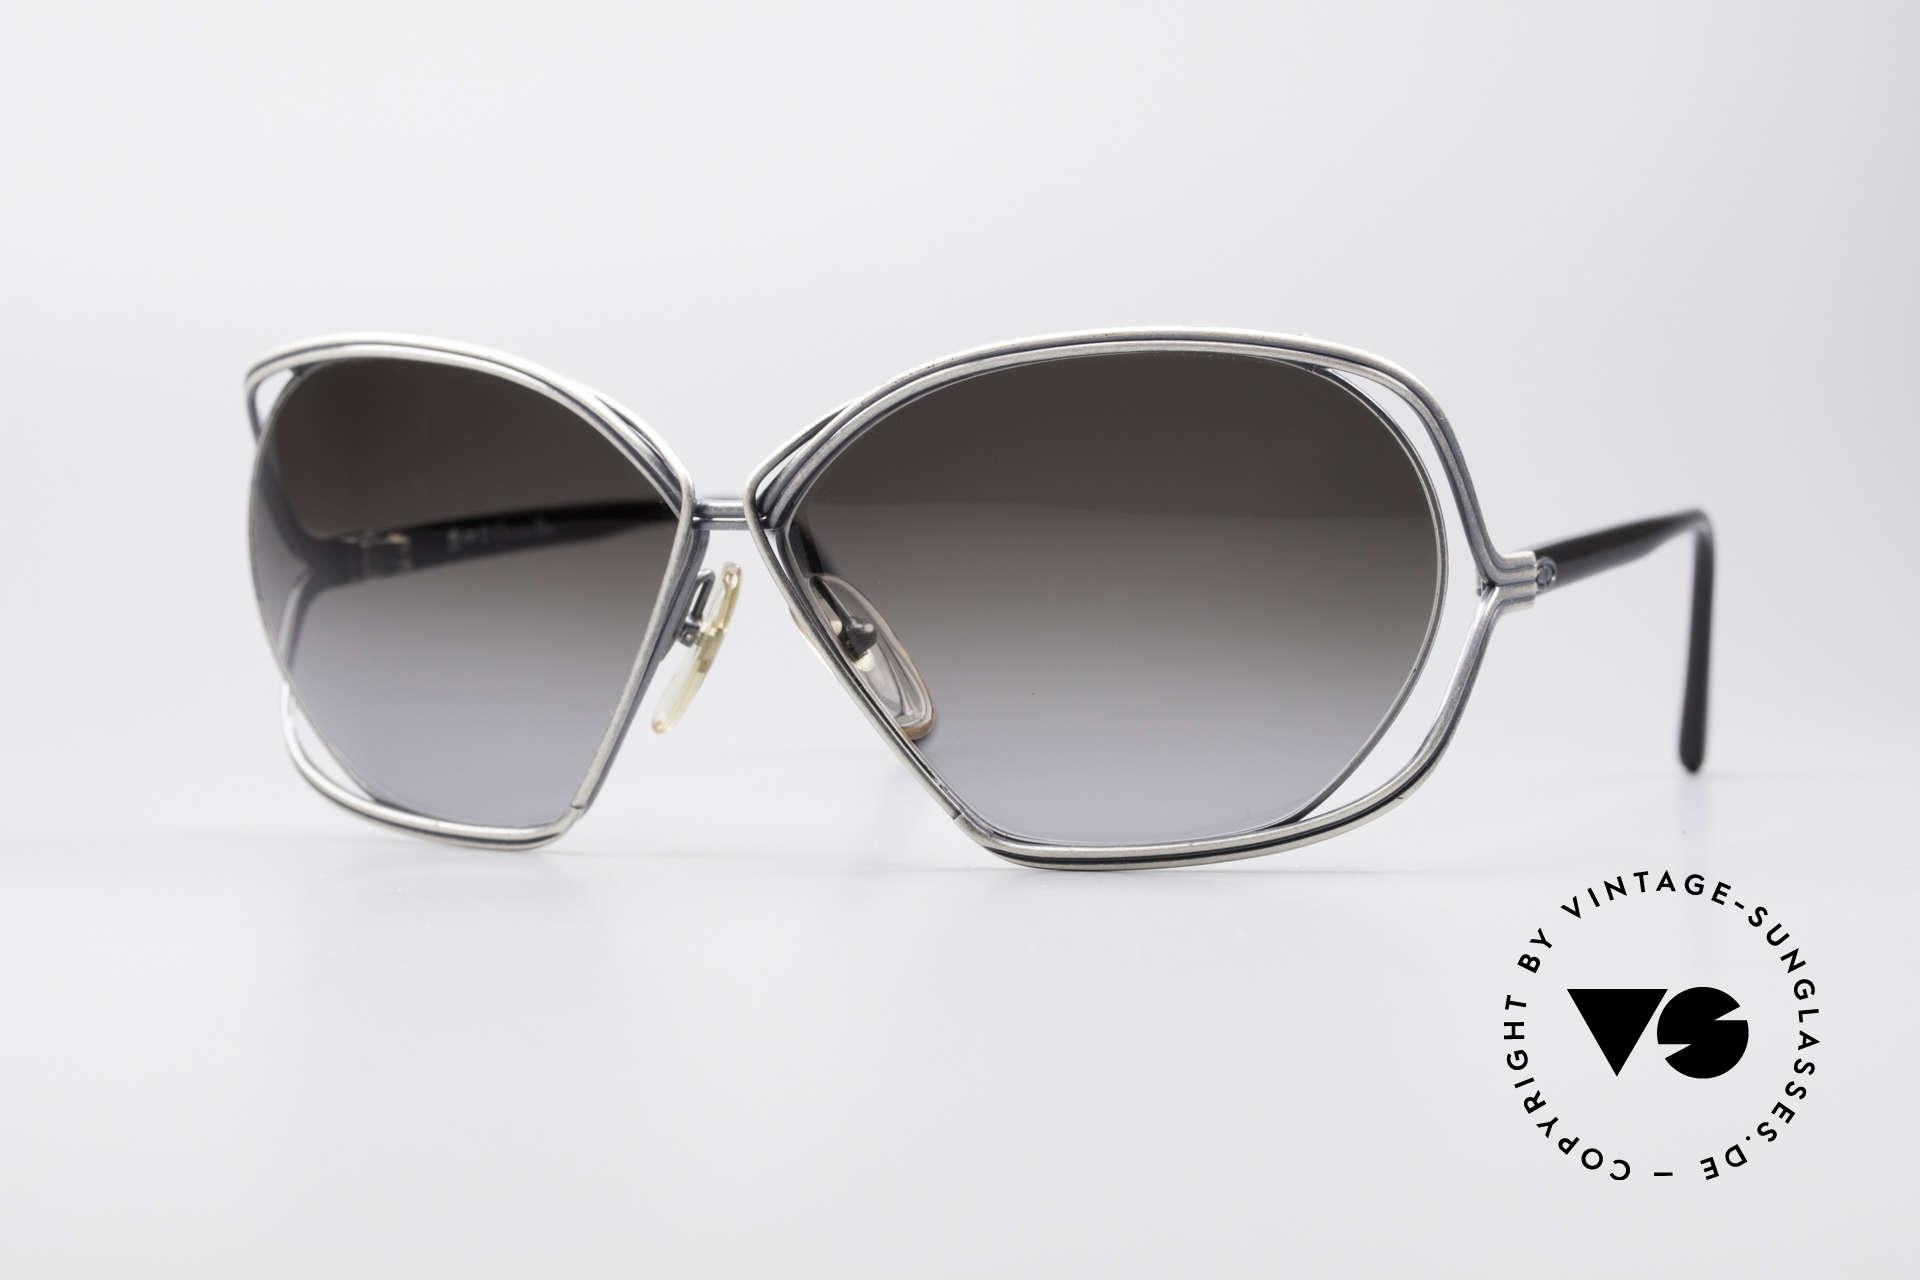 Christian Dior 2499 Ladies Sunglasses 80's, glamorous ladies' designer sunglasses of the 1980's, Made for Women